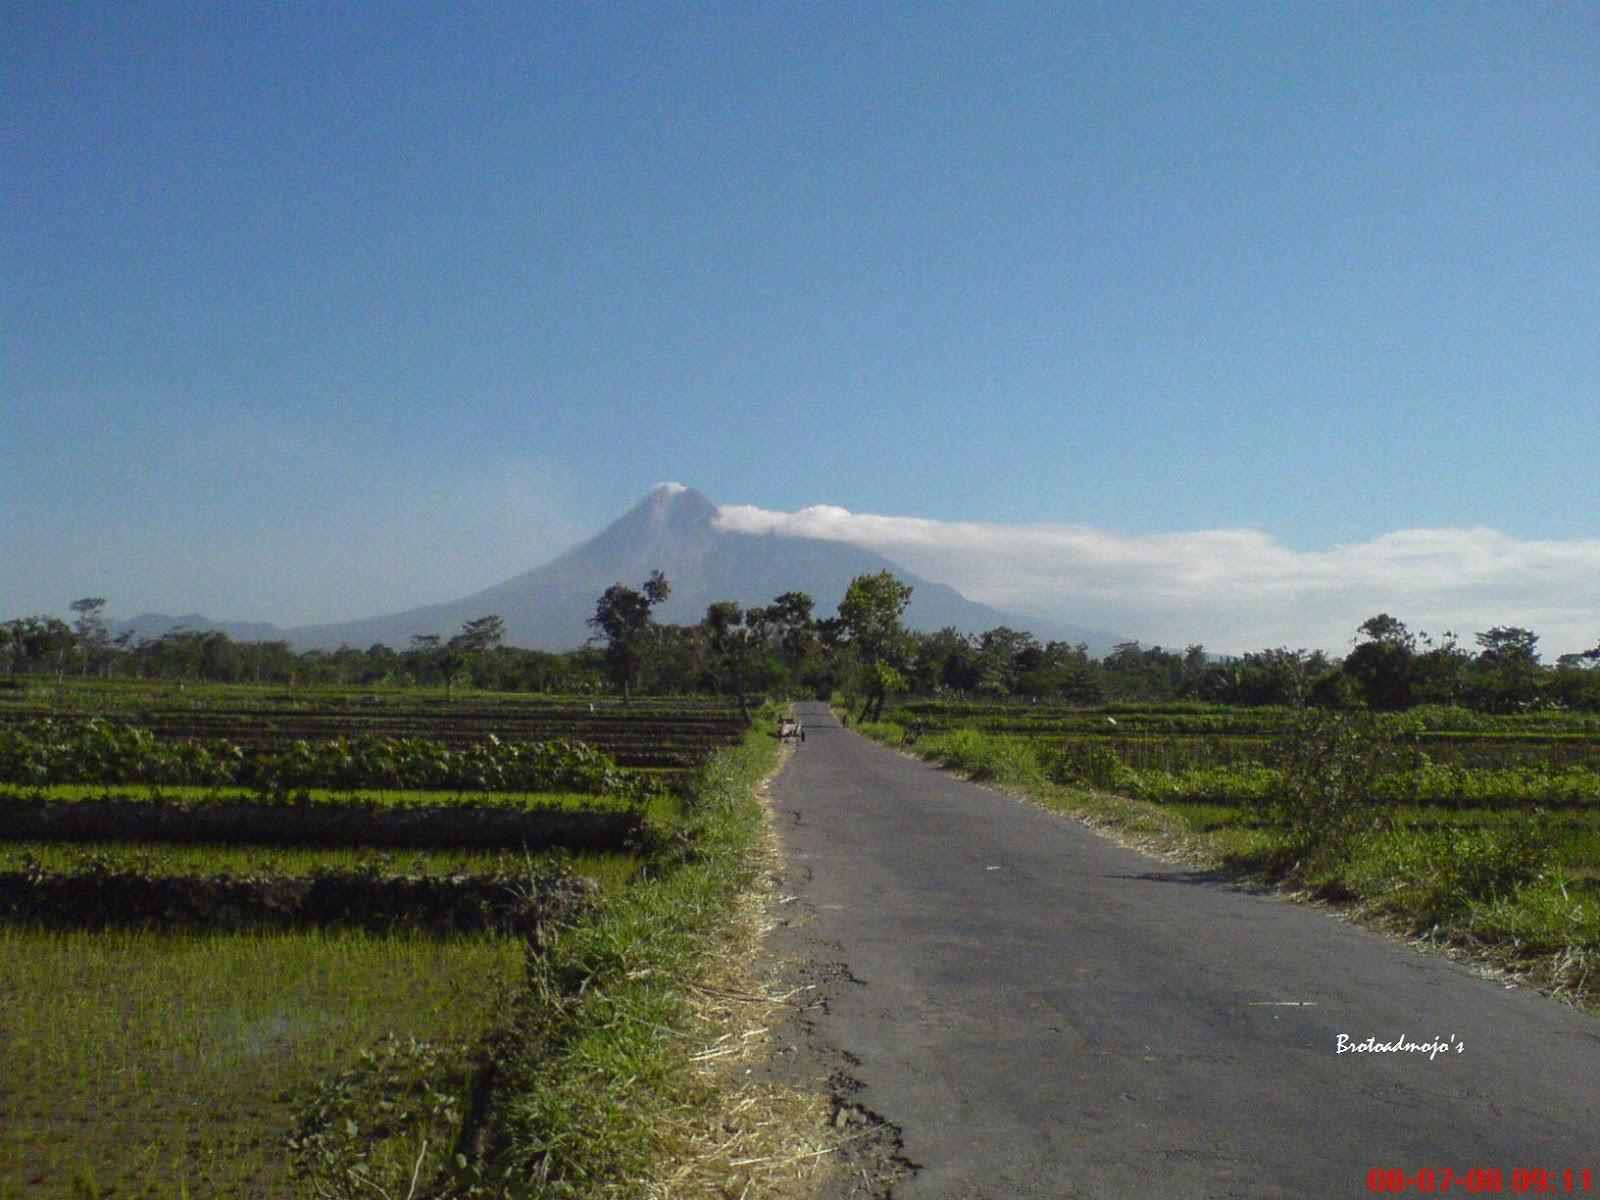 Karakteristik Gunung Merapi - merapi.bgl.esdm.go.id